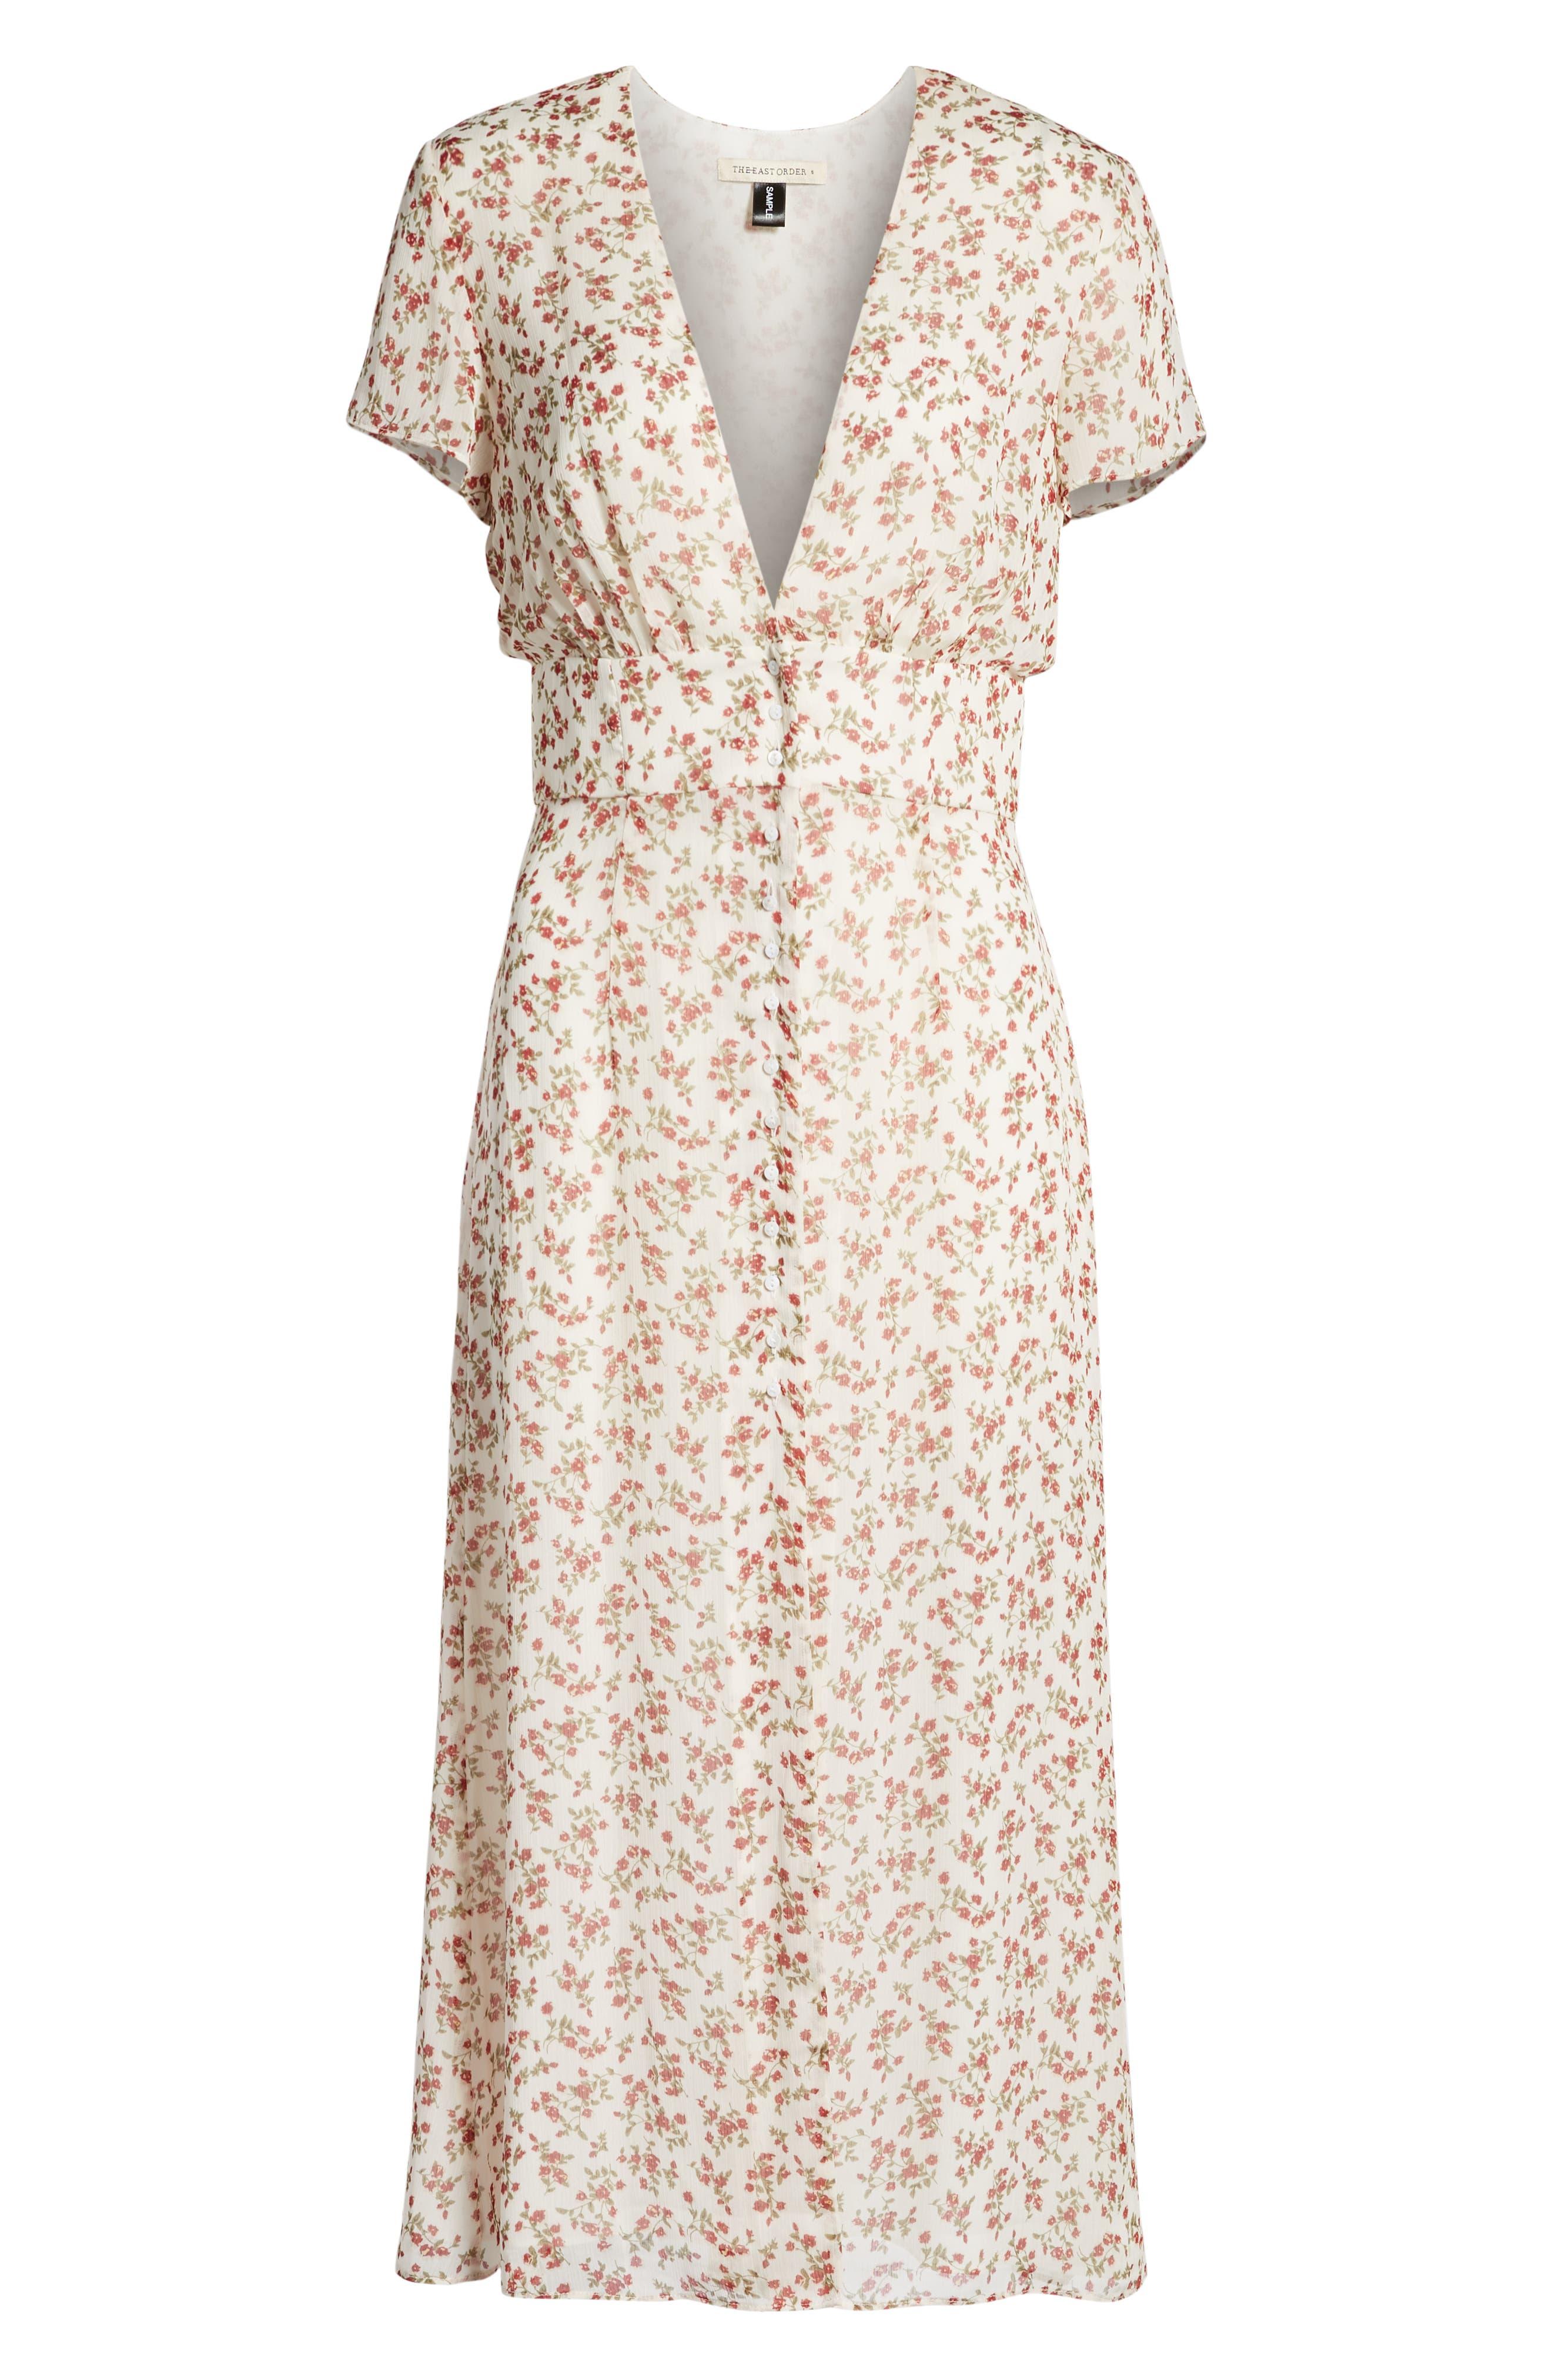 Faretta Midi Dress,                             Alternate thumbnail 7, color,                             RED ROMANCE FLORAL